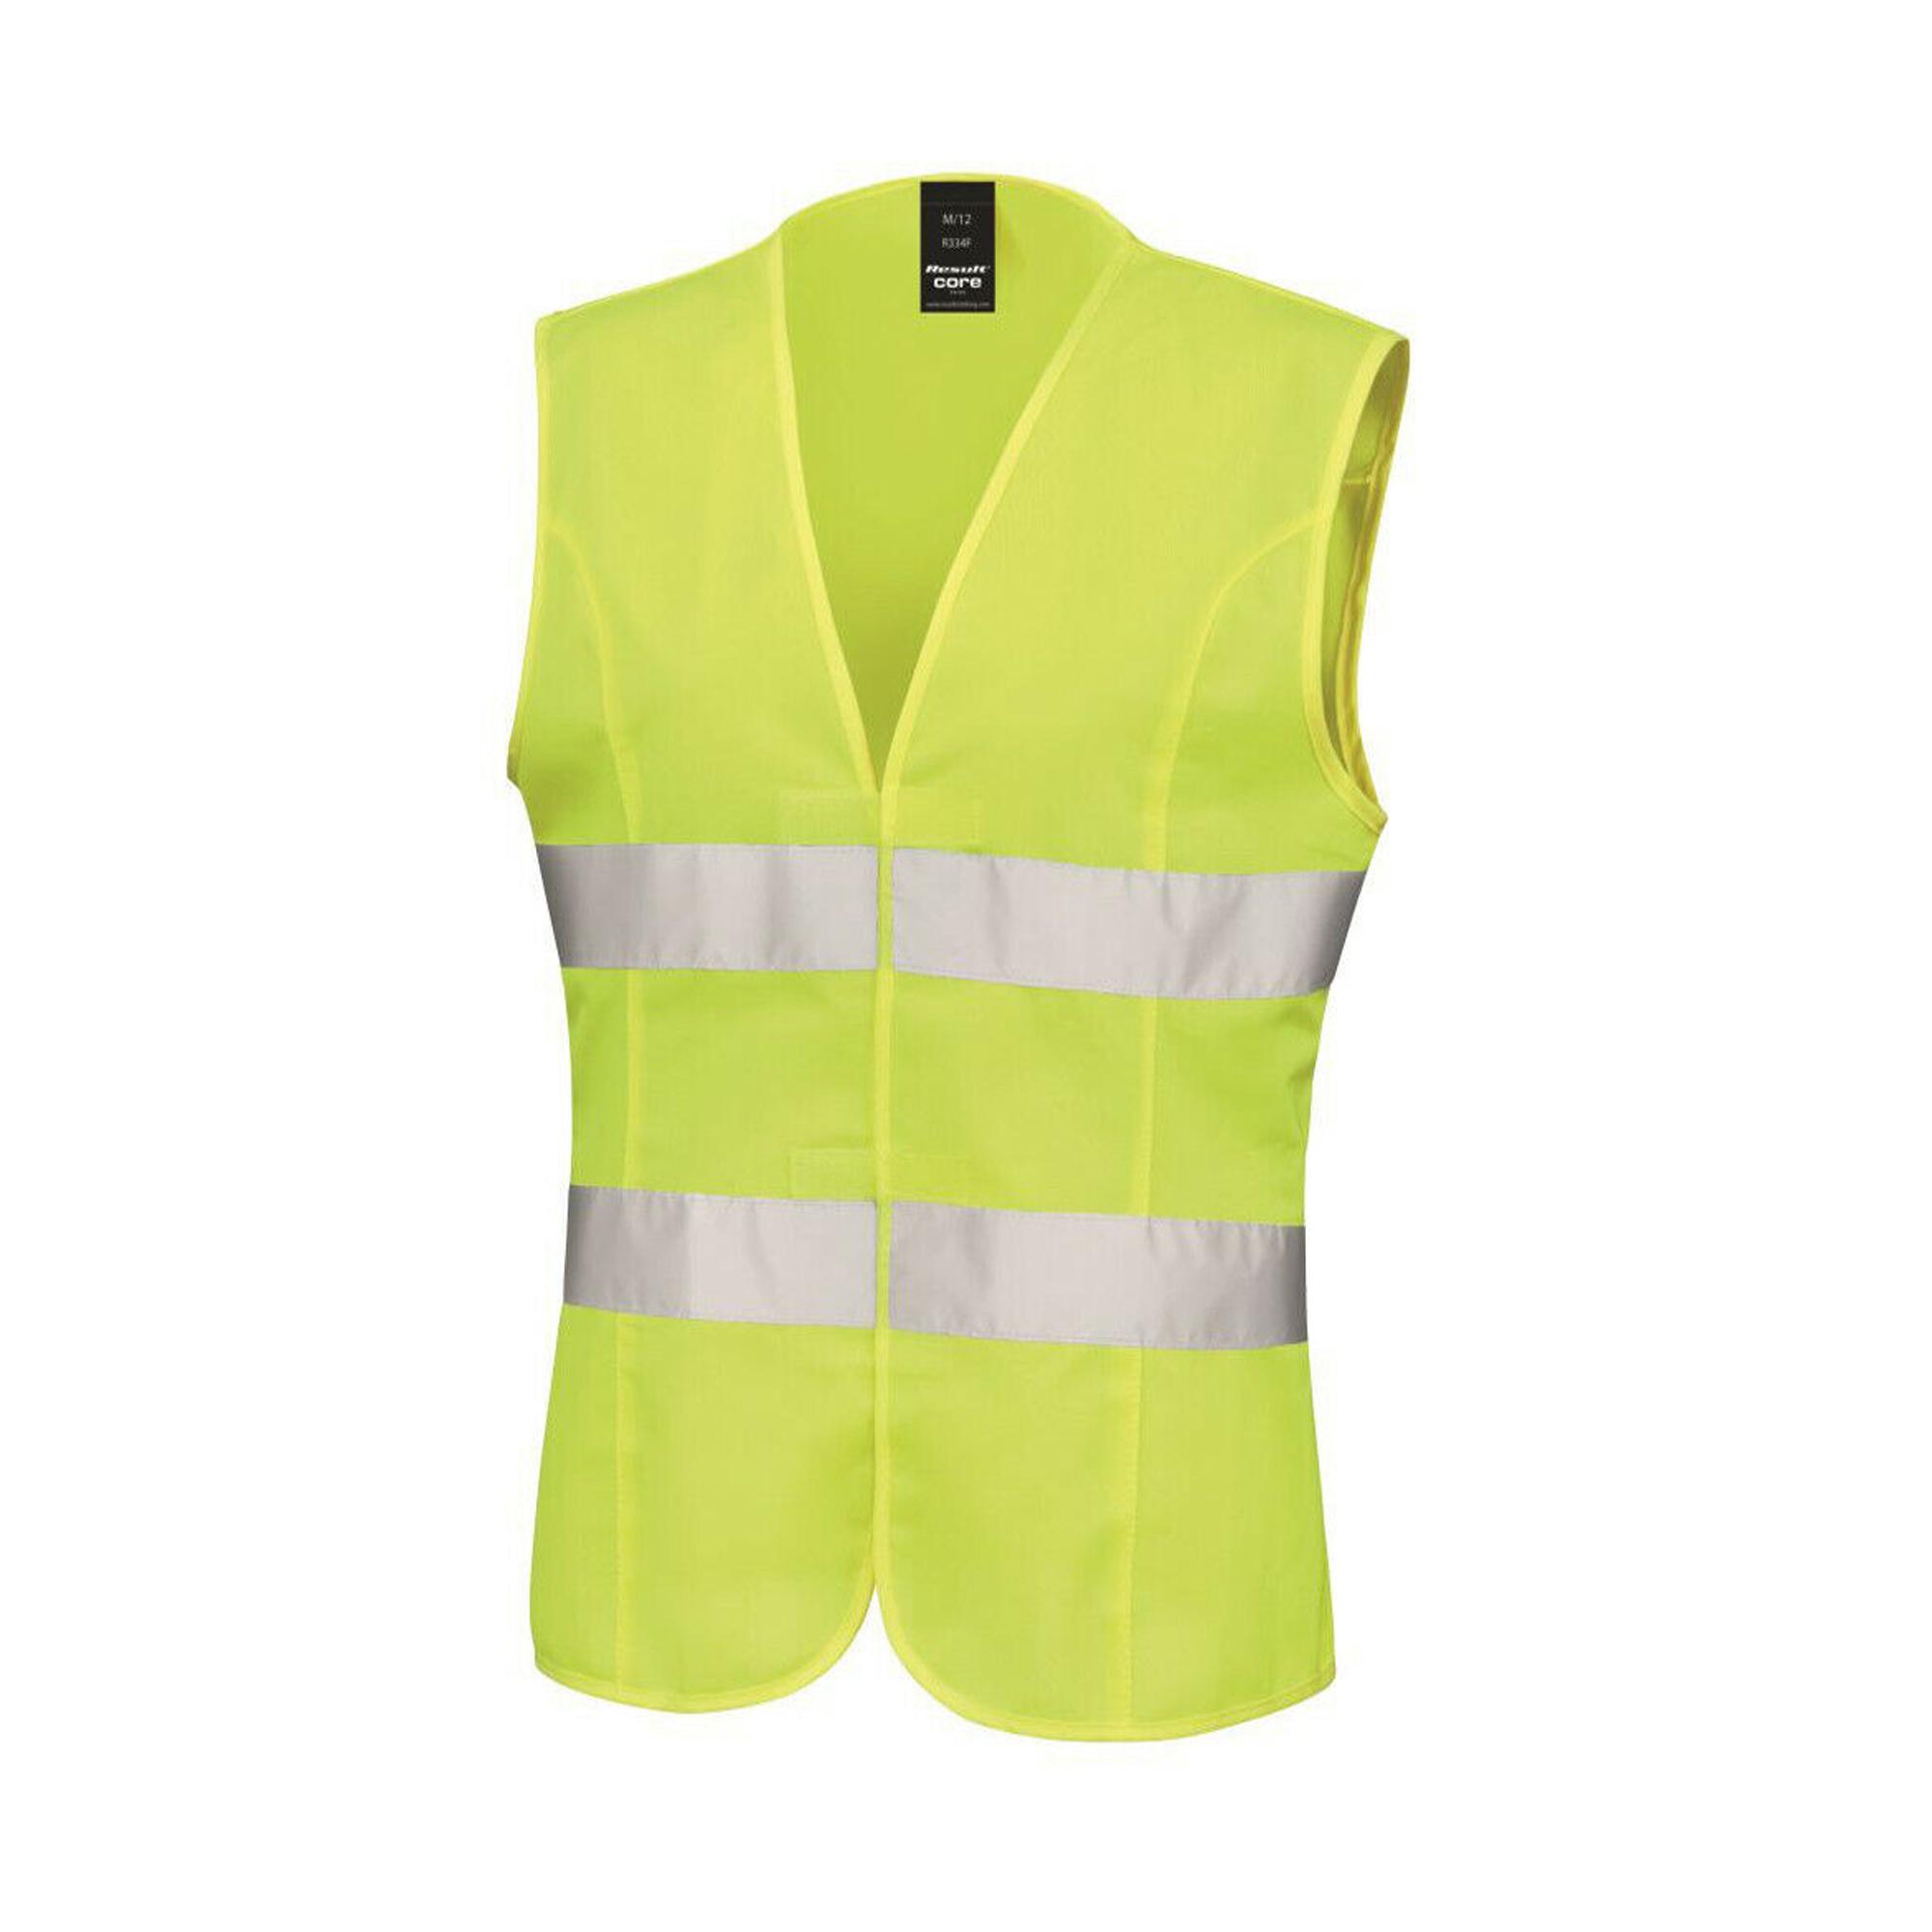 Result core womens ladies sleeveless hi vis vest ebay for Ikea safety vest